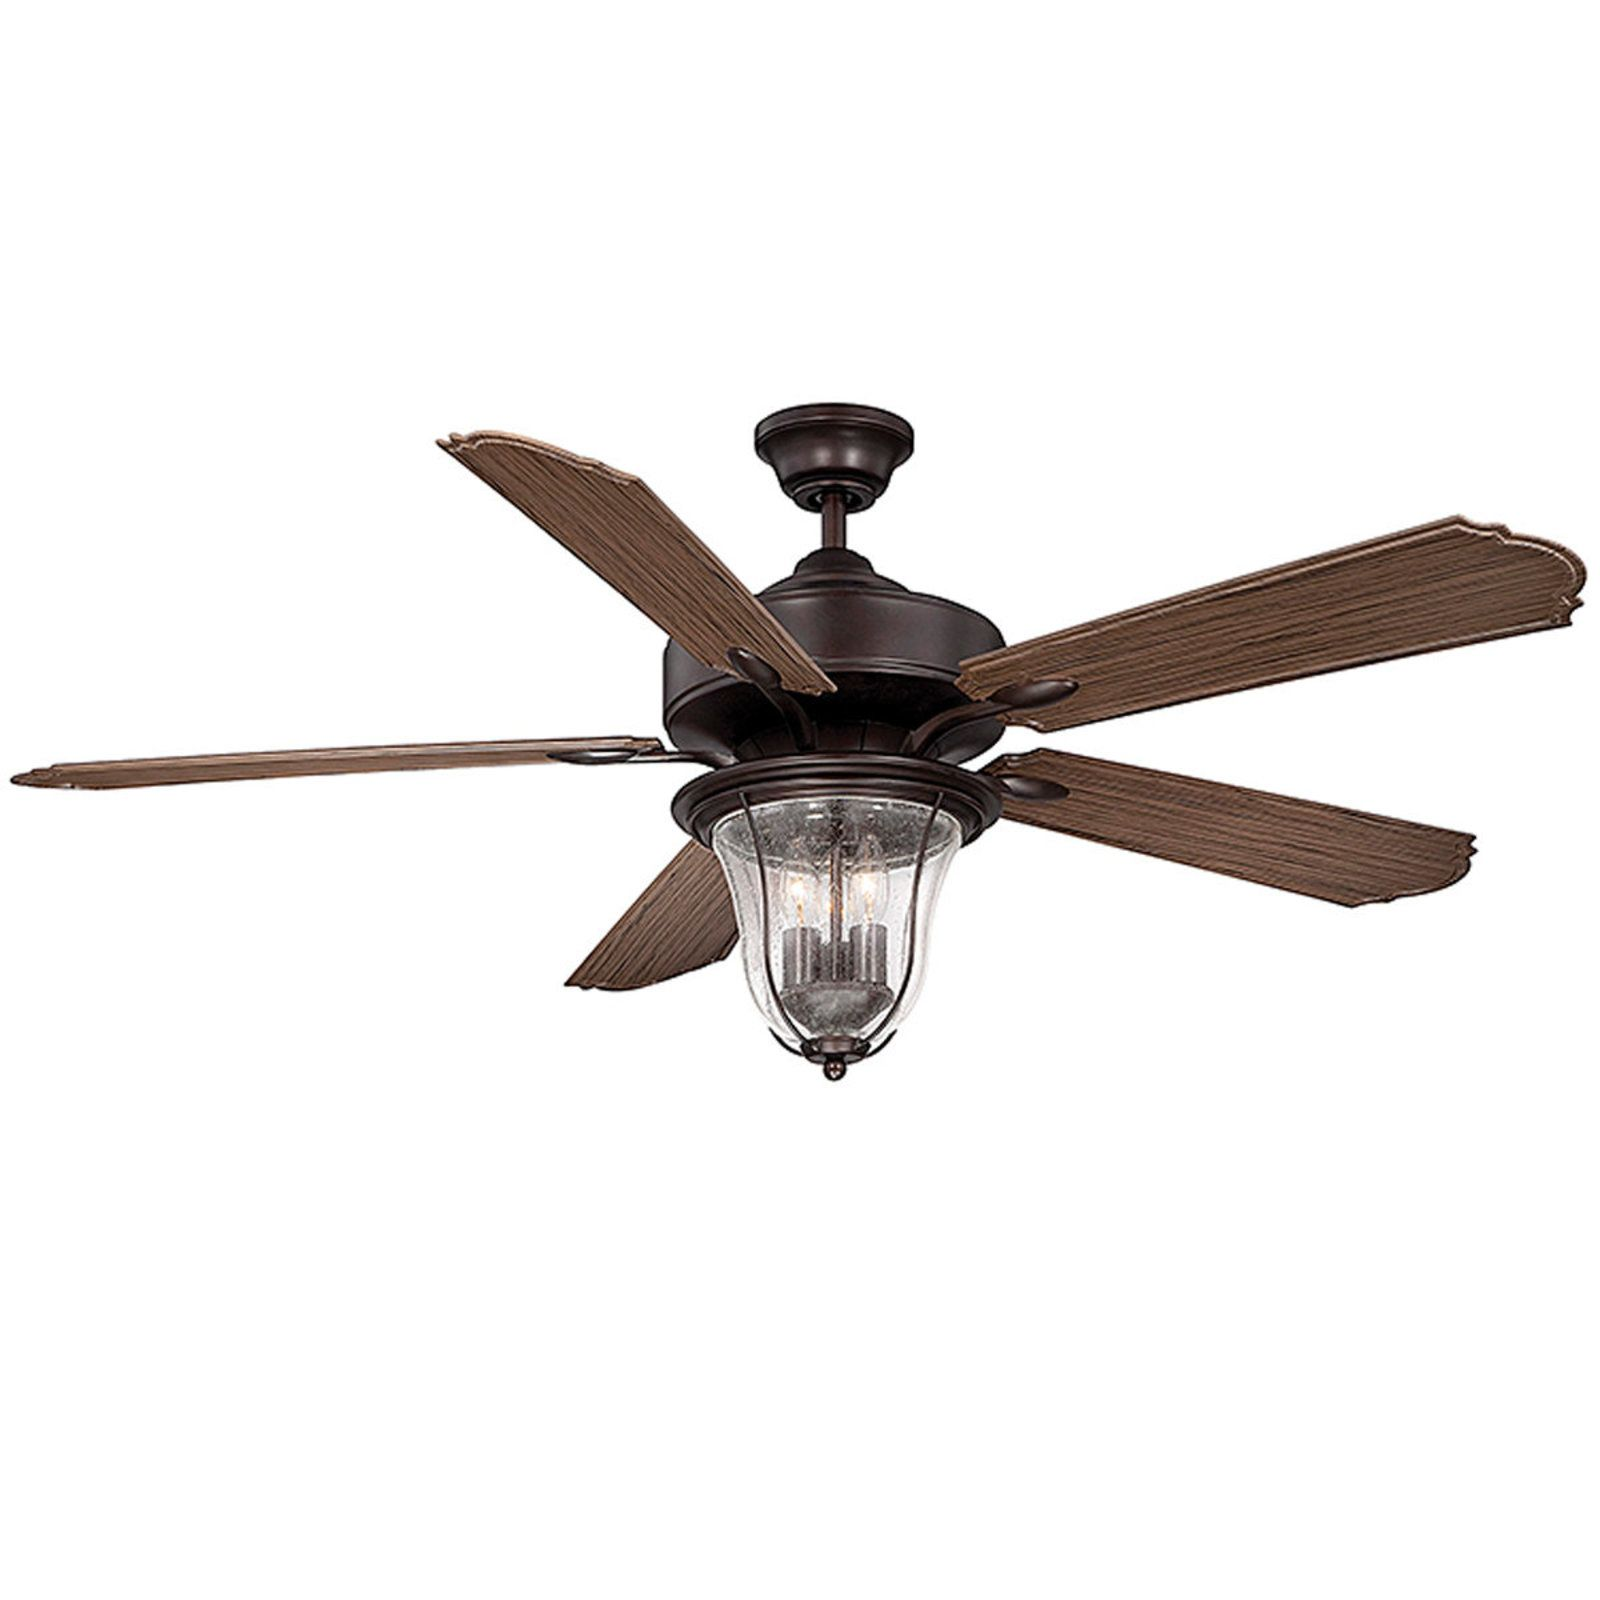 Clear Bubble Glass Ceiling Fan English Bronze Ceiling Fan Outdoor Ceiling Fans Ceiling Fan Shade Outdoor ceiling fans on sale